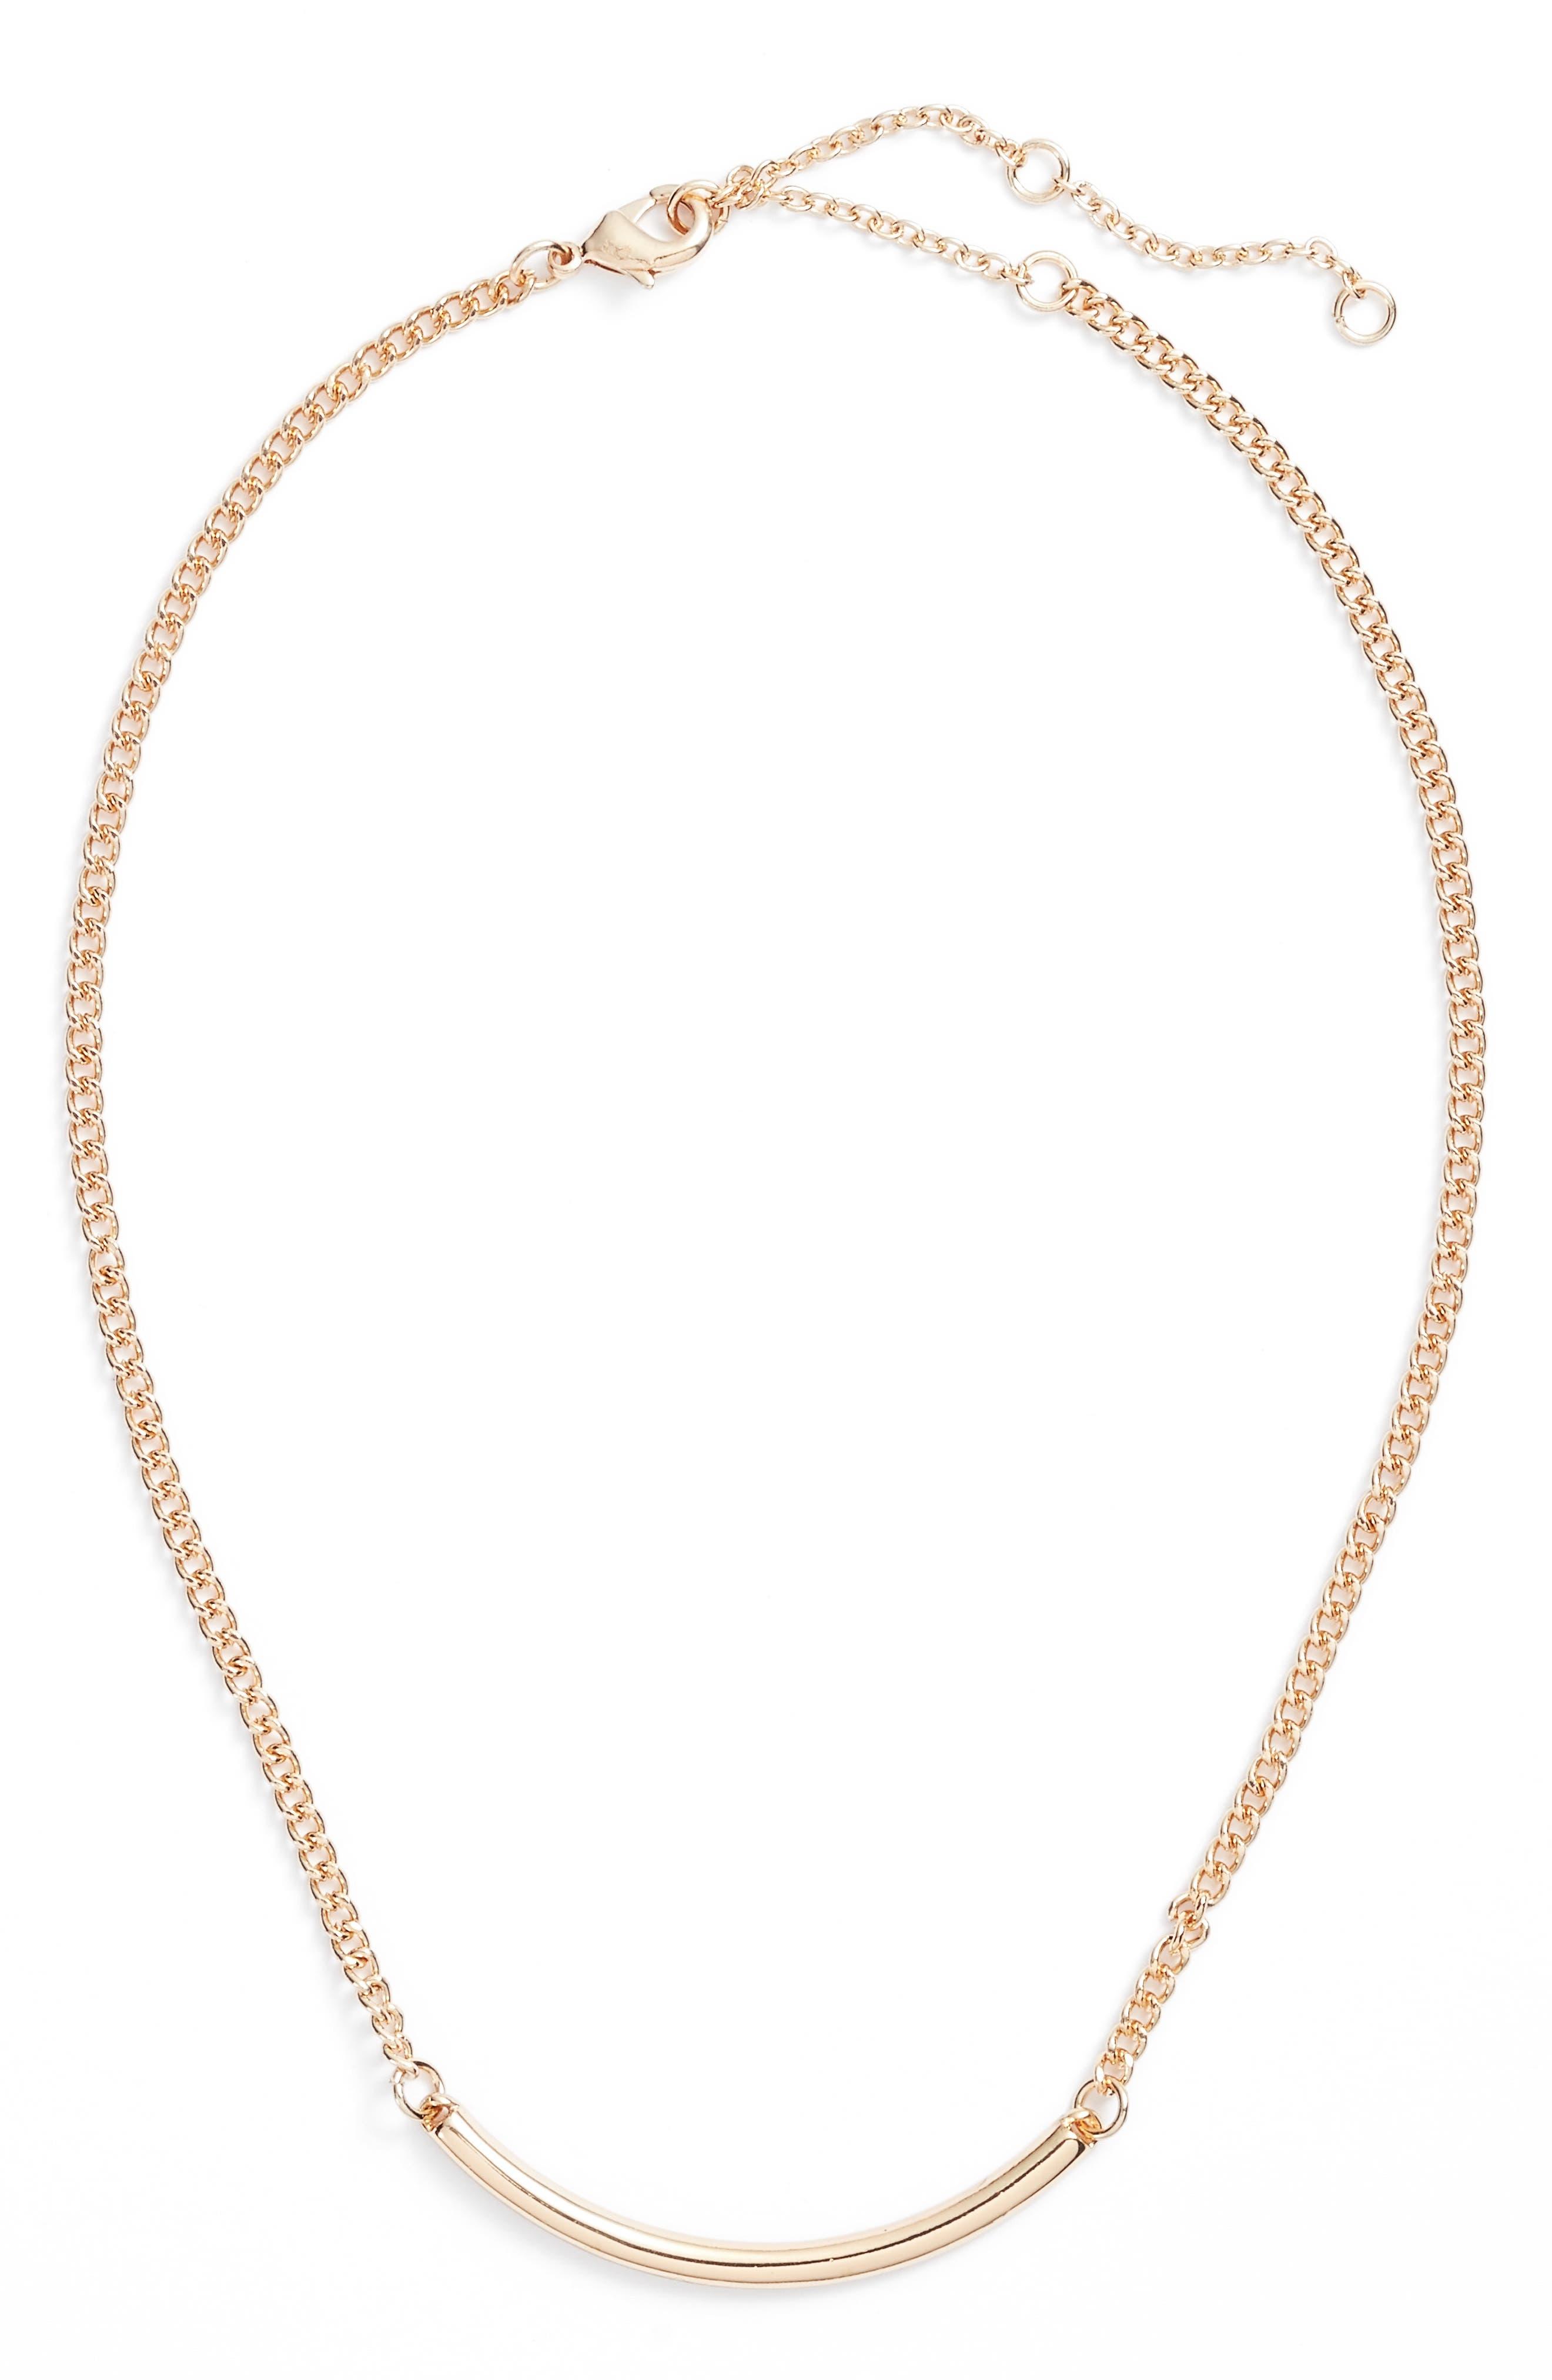 Main Image - BP. Dainty Chain Bar Necklace